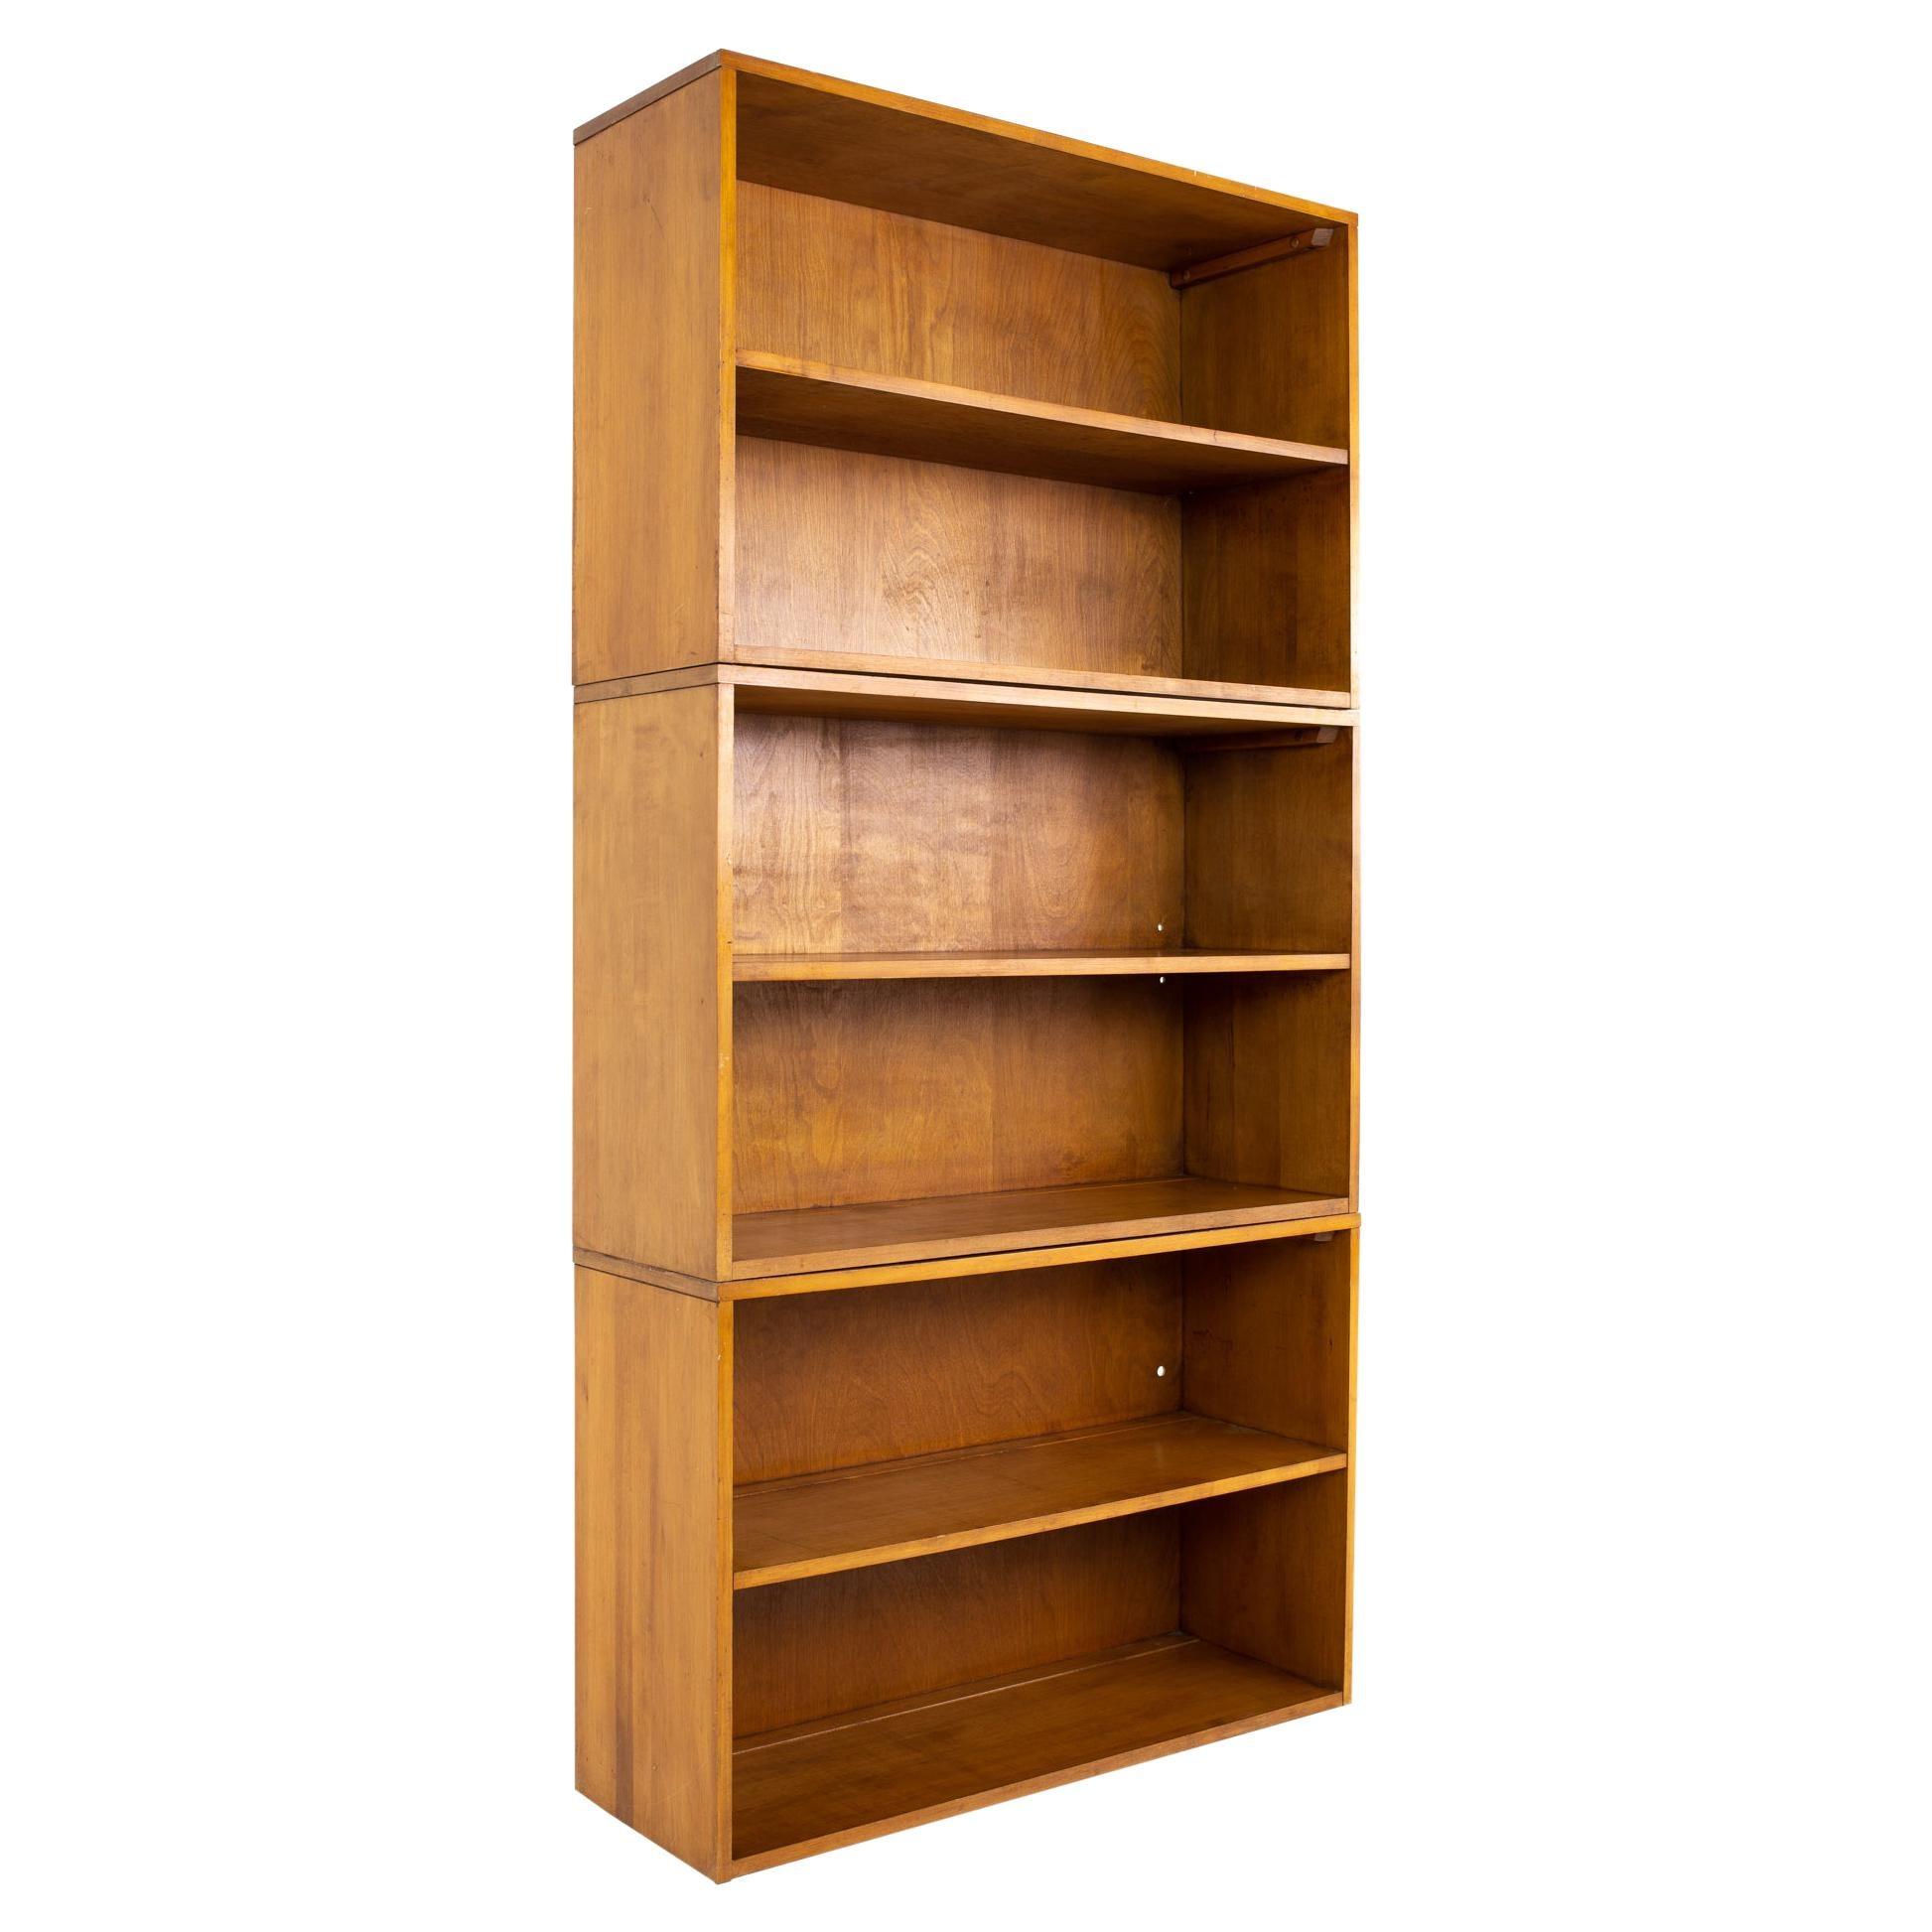 Paul McCobb Mid Century Bookcase